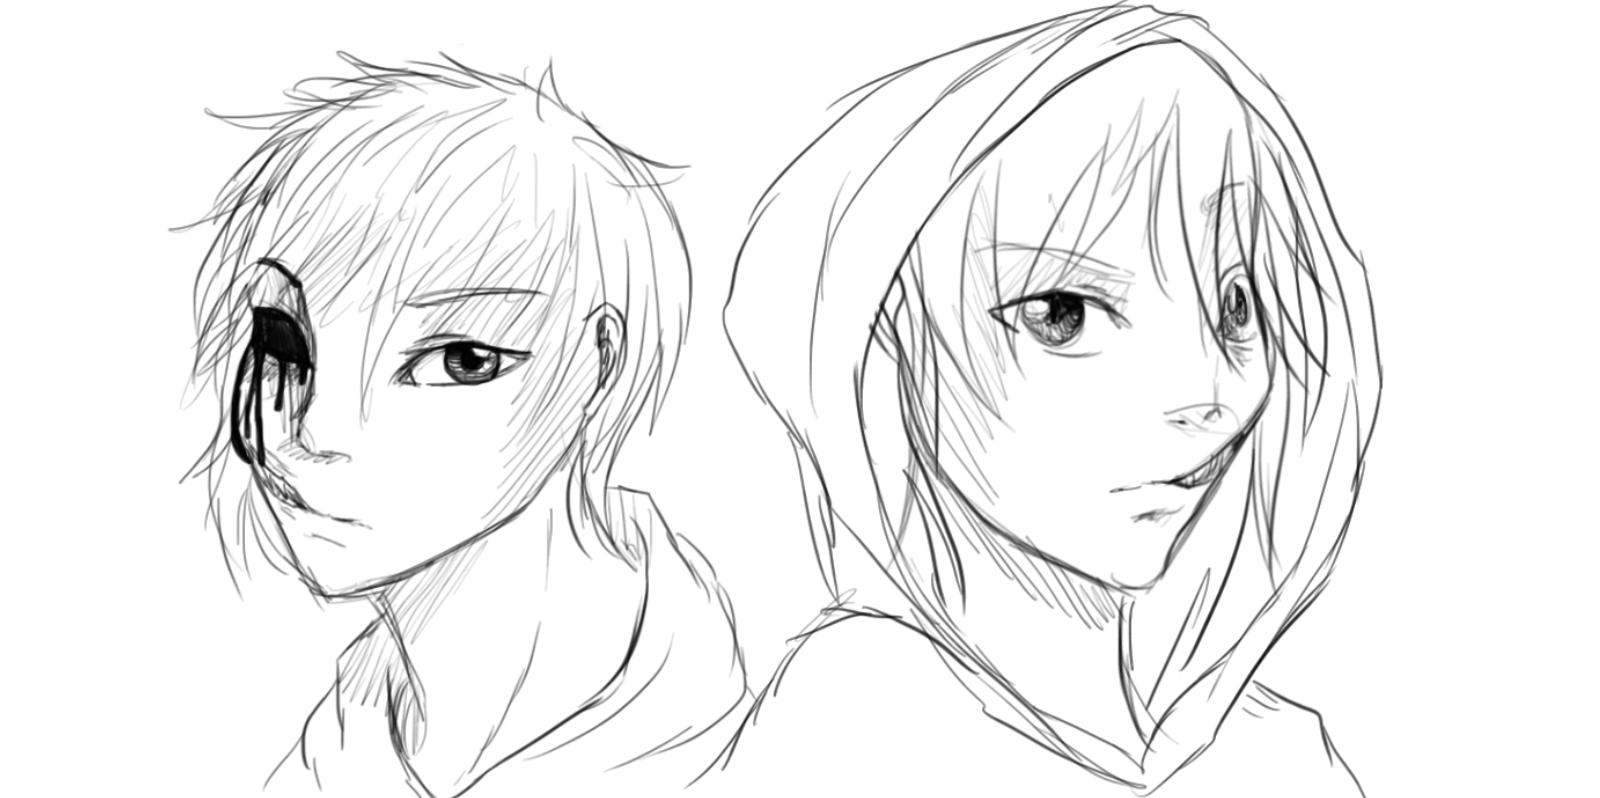 Drawn eyeless jack human By Killer Killer animecake55 by